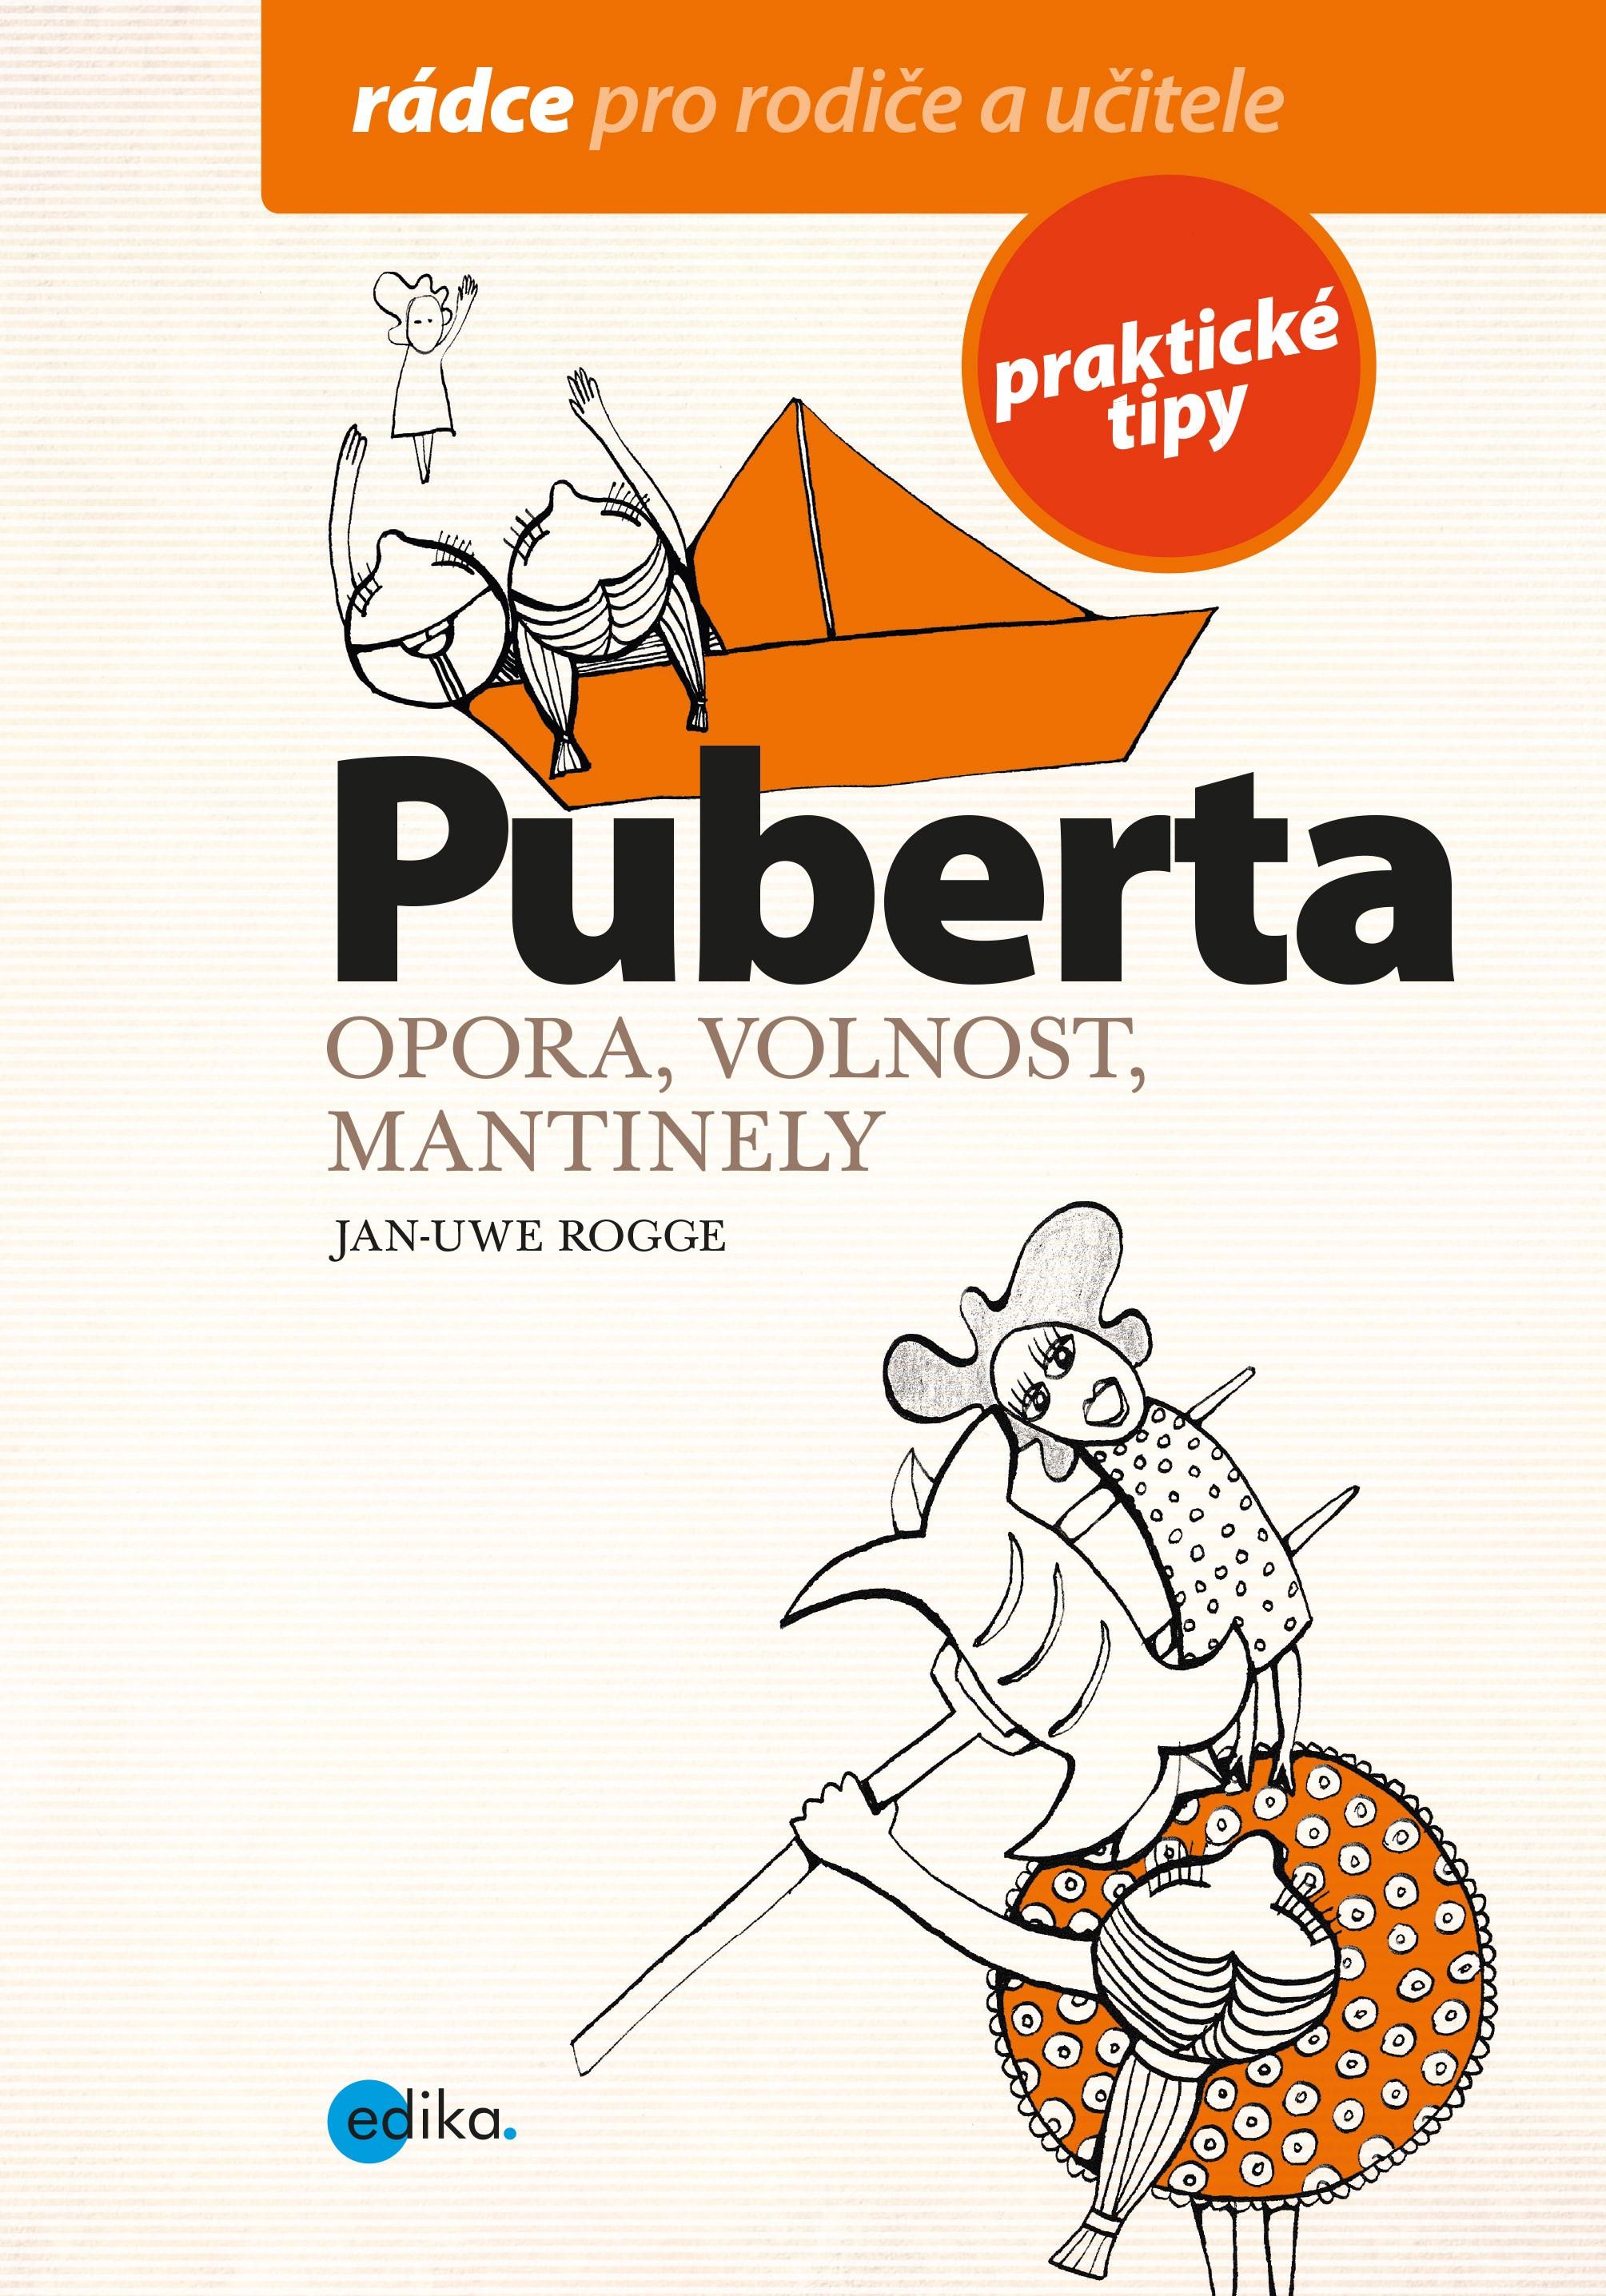 Puberta - Opora, volnost, mantinely - Jan Uwe-Rogge